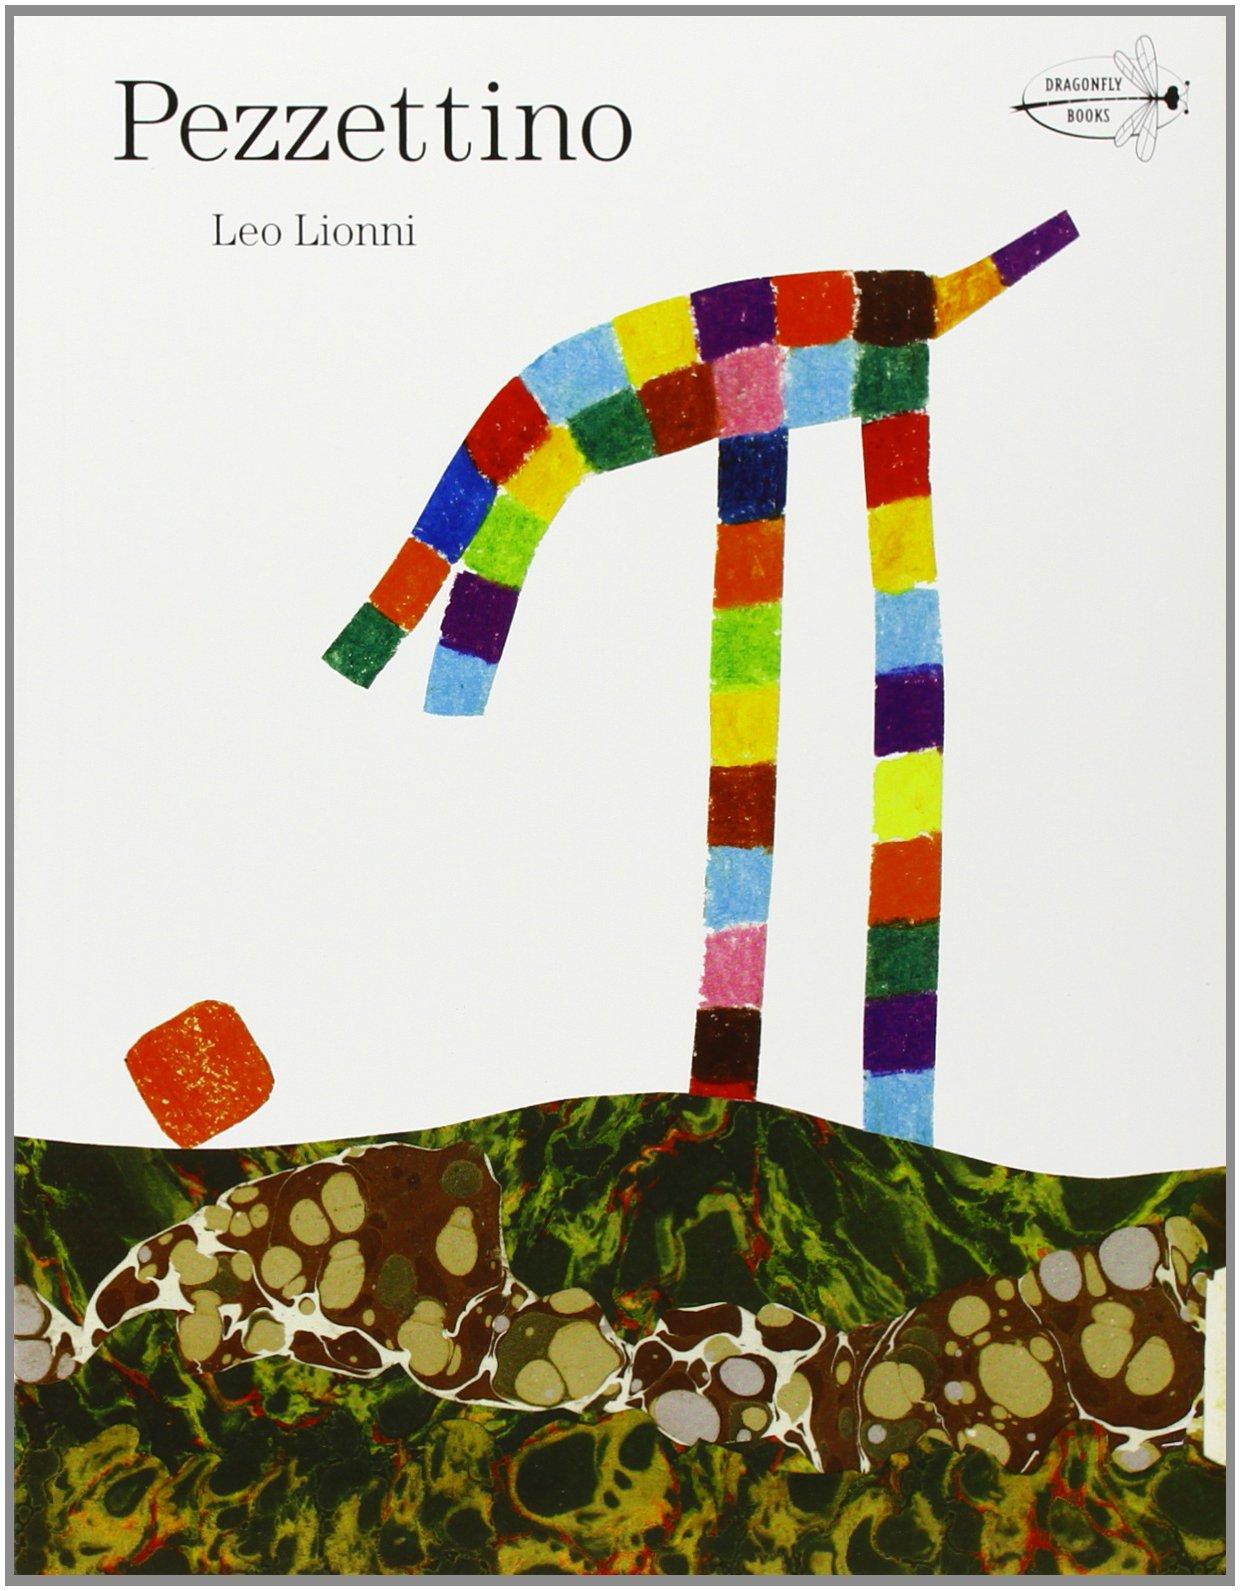 Pezzettino - Leo Lionni ile ilgili görsel sonucu